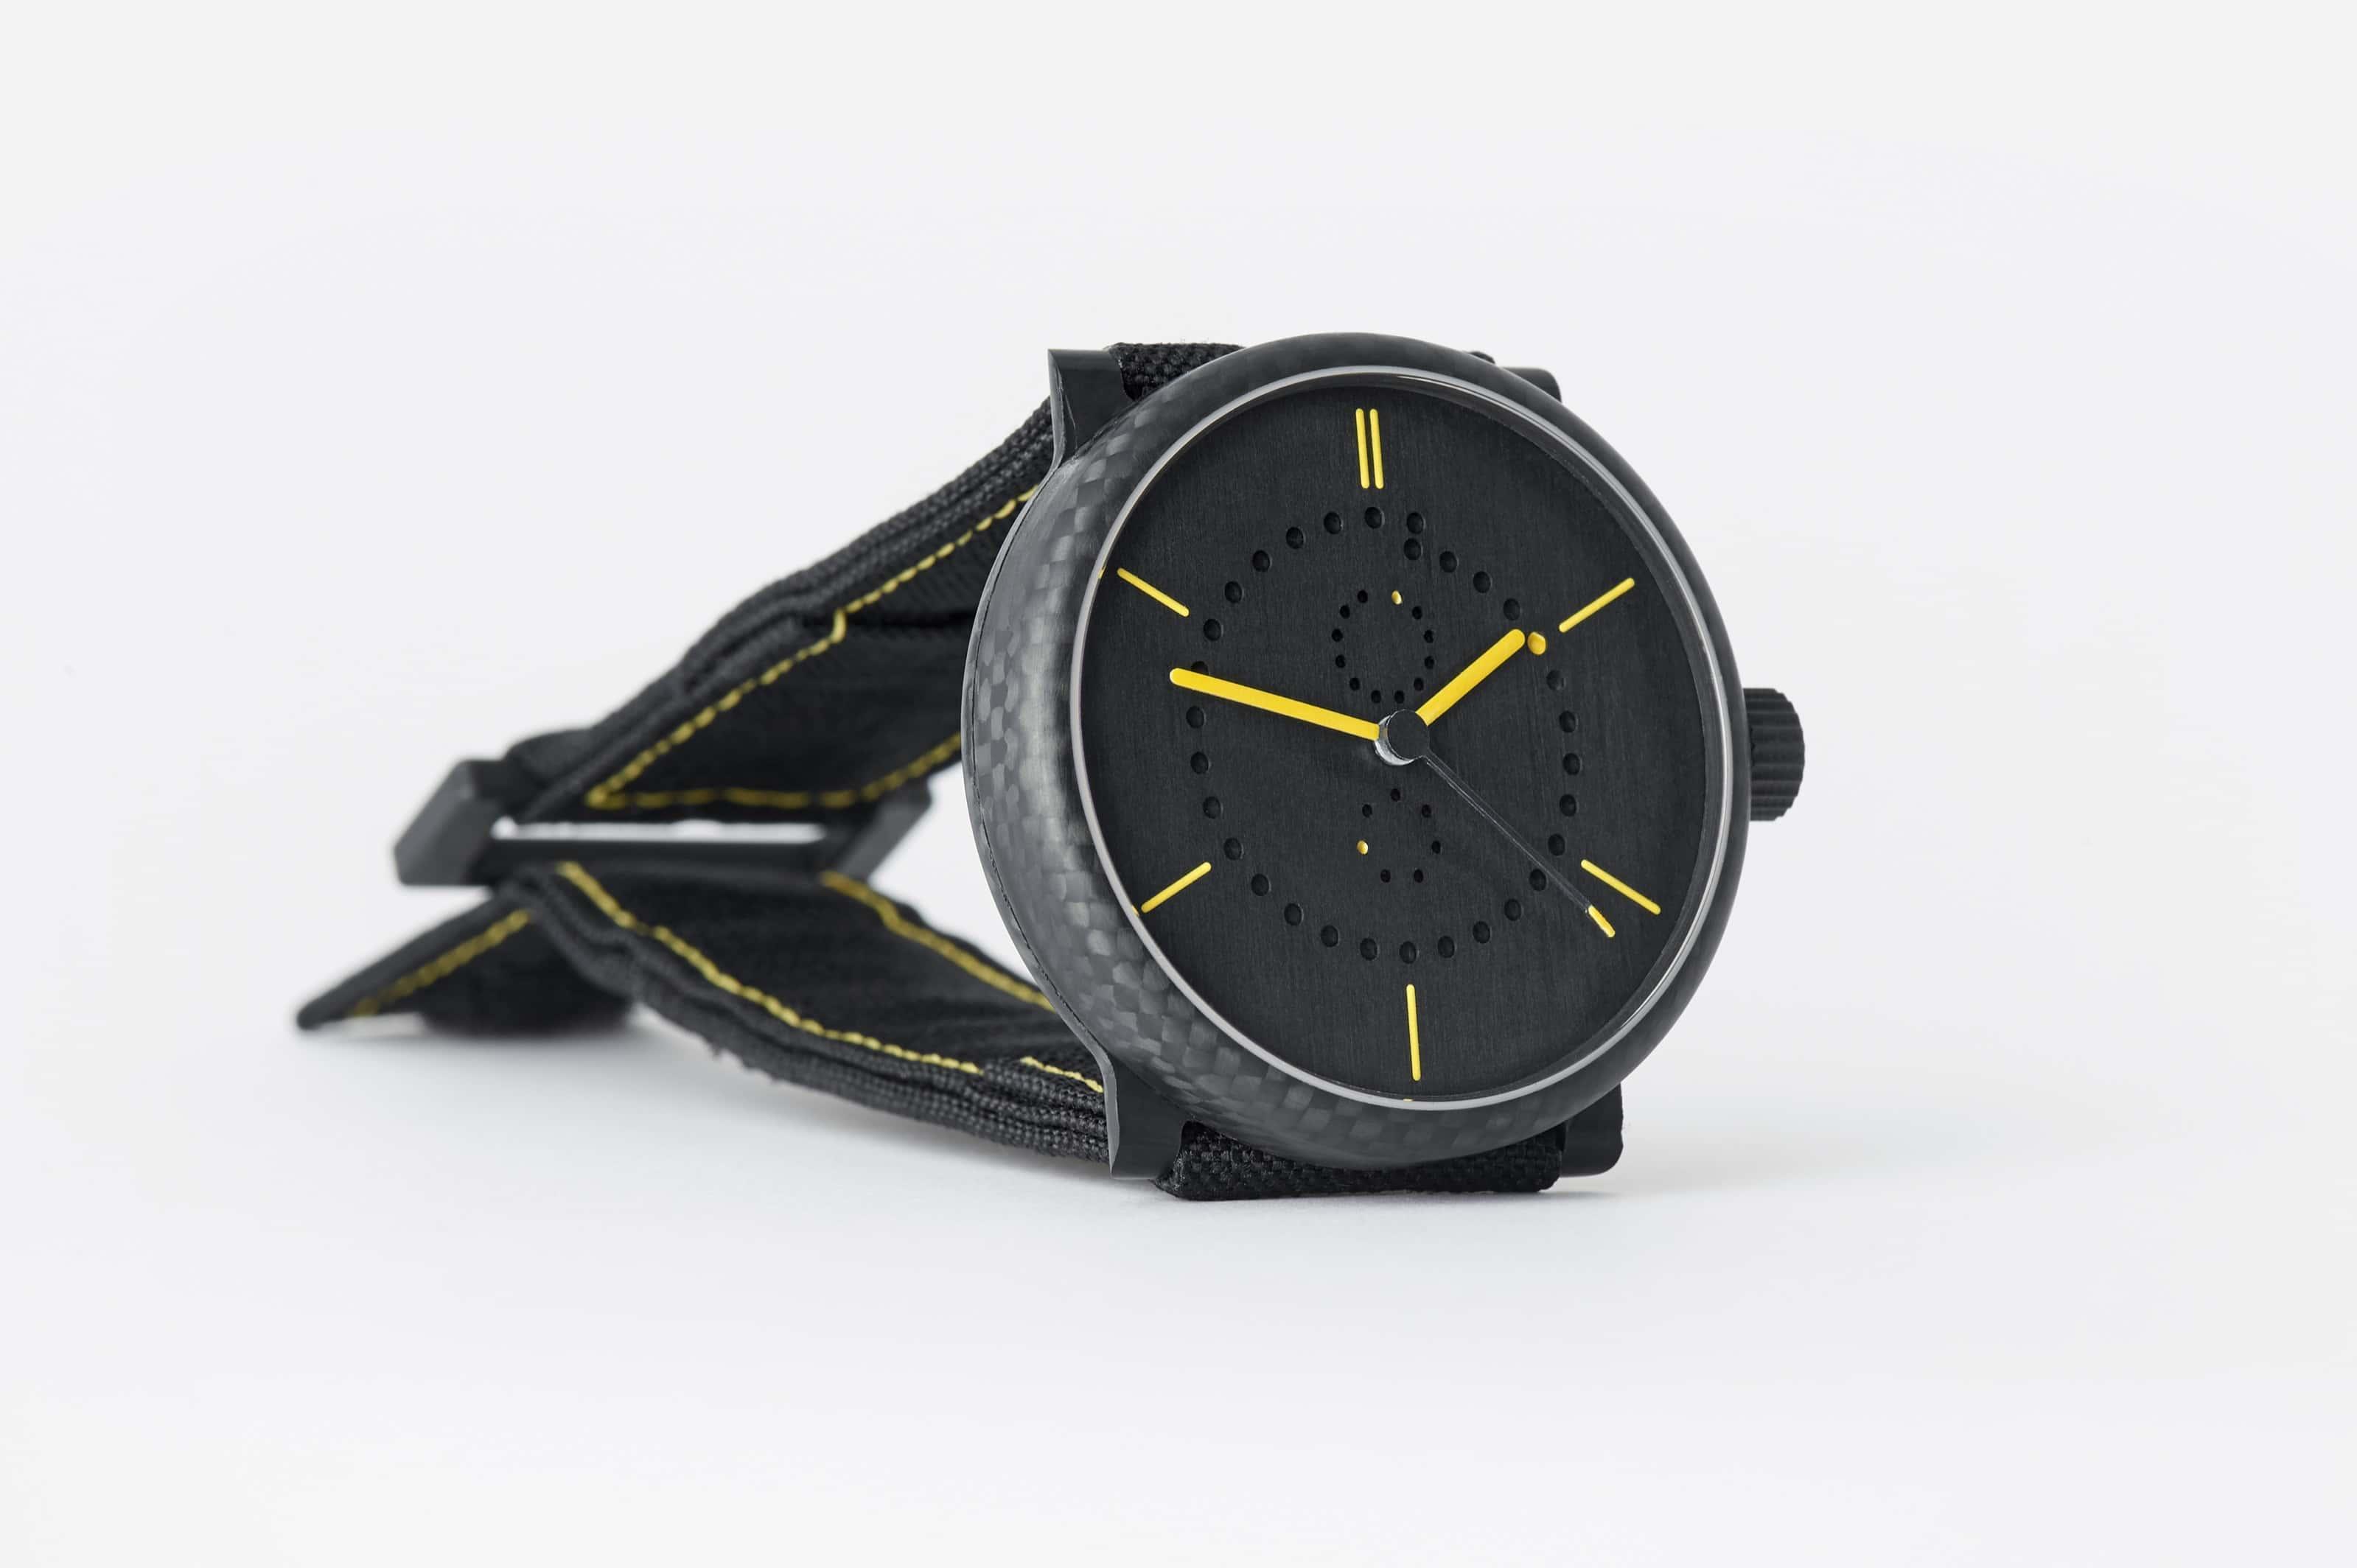 carbon-fiber-annual-calendar-watch-ochs-und-junior-9_RGB-3198px